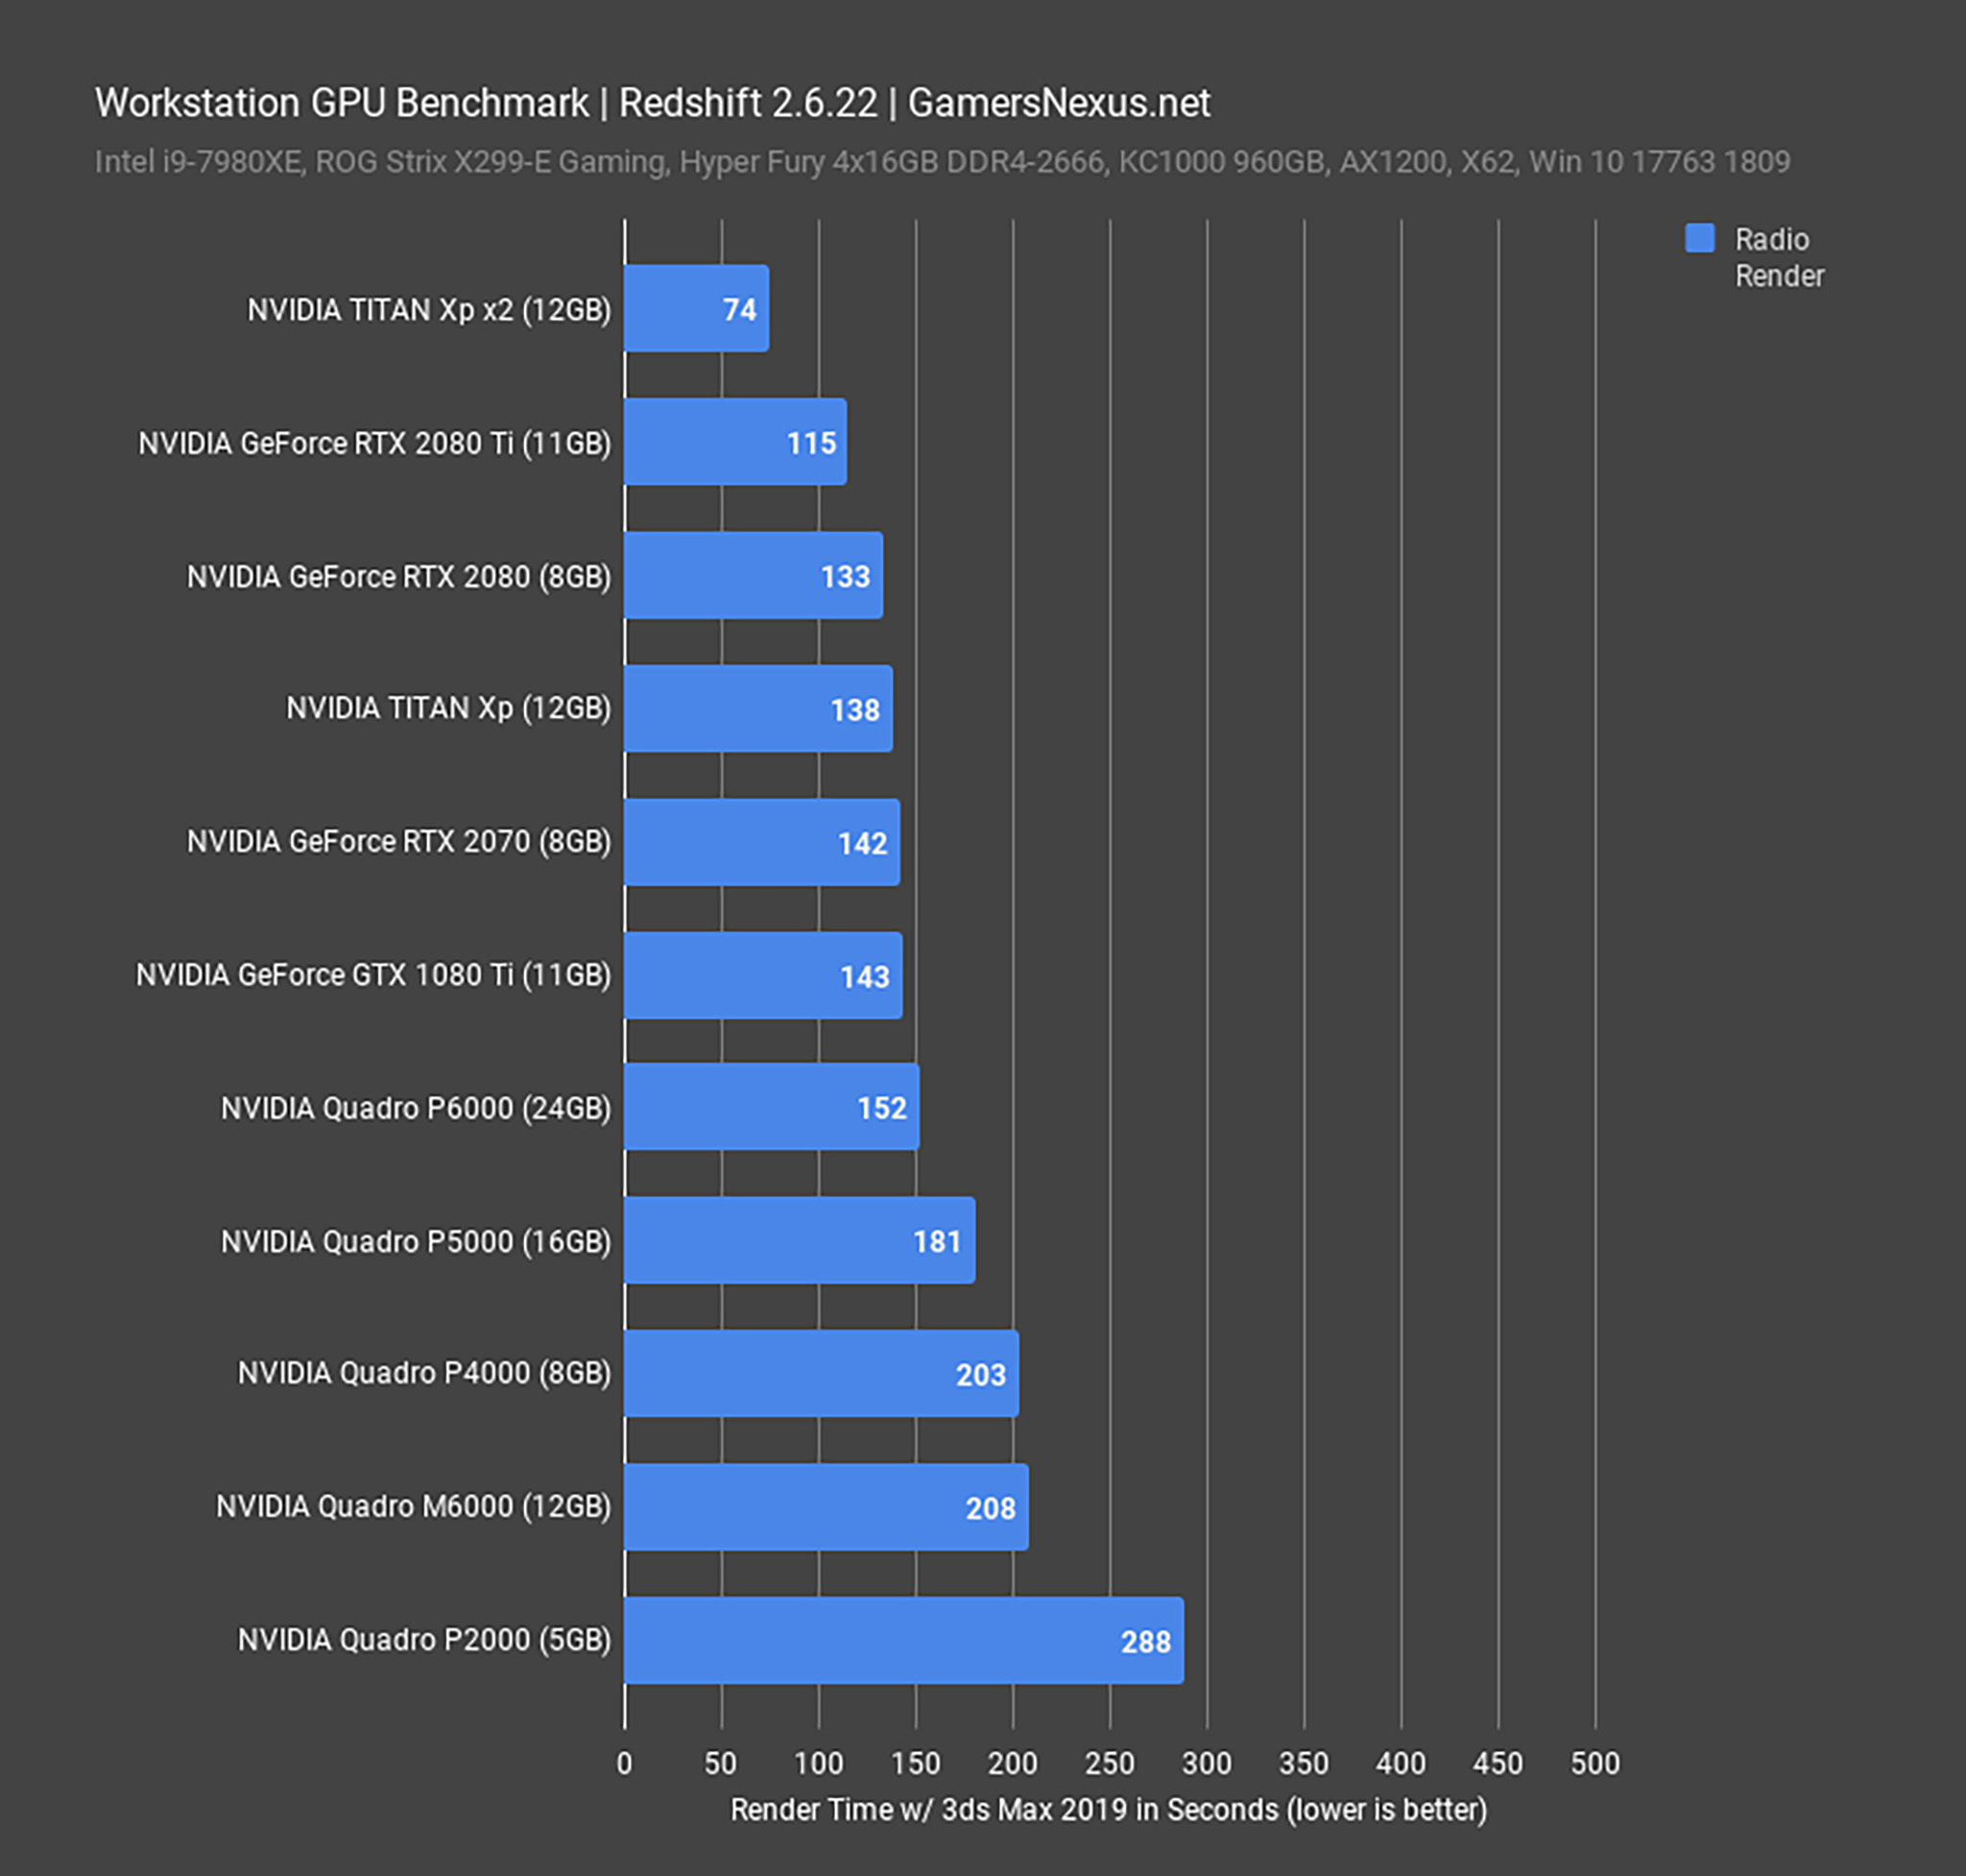 workstation-gpu-benchmark_redshift.jpg